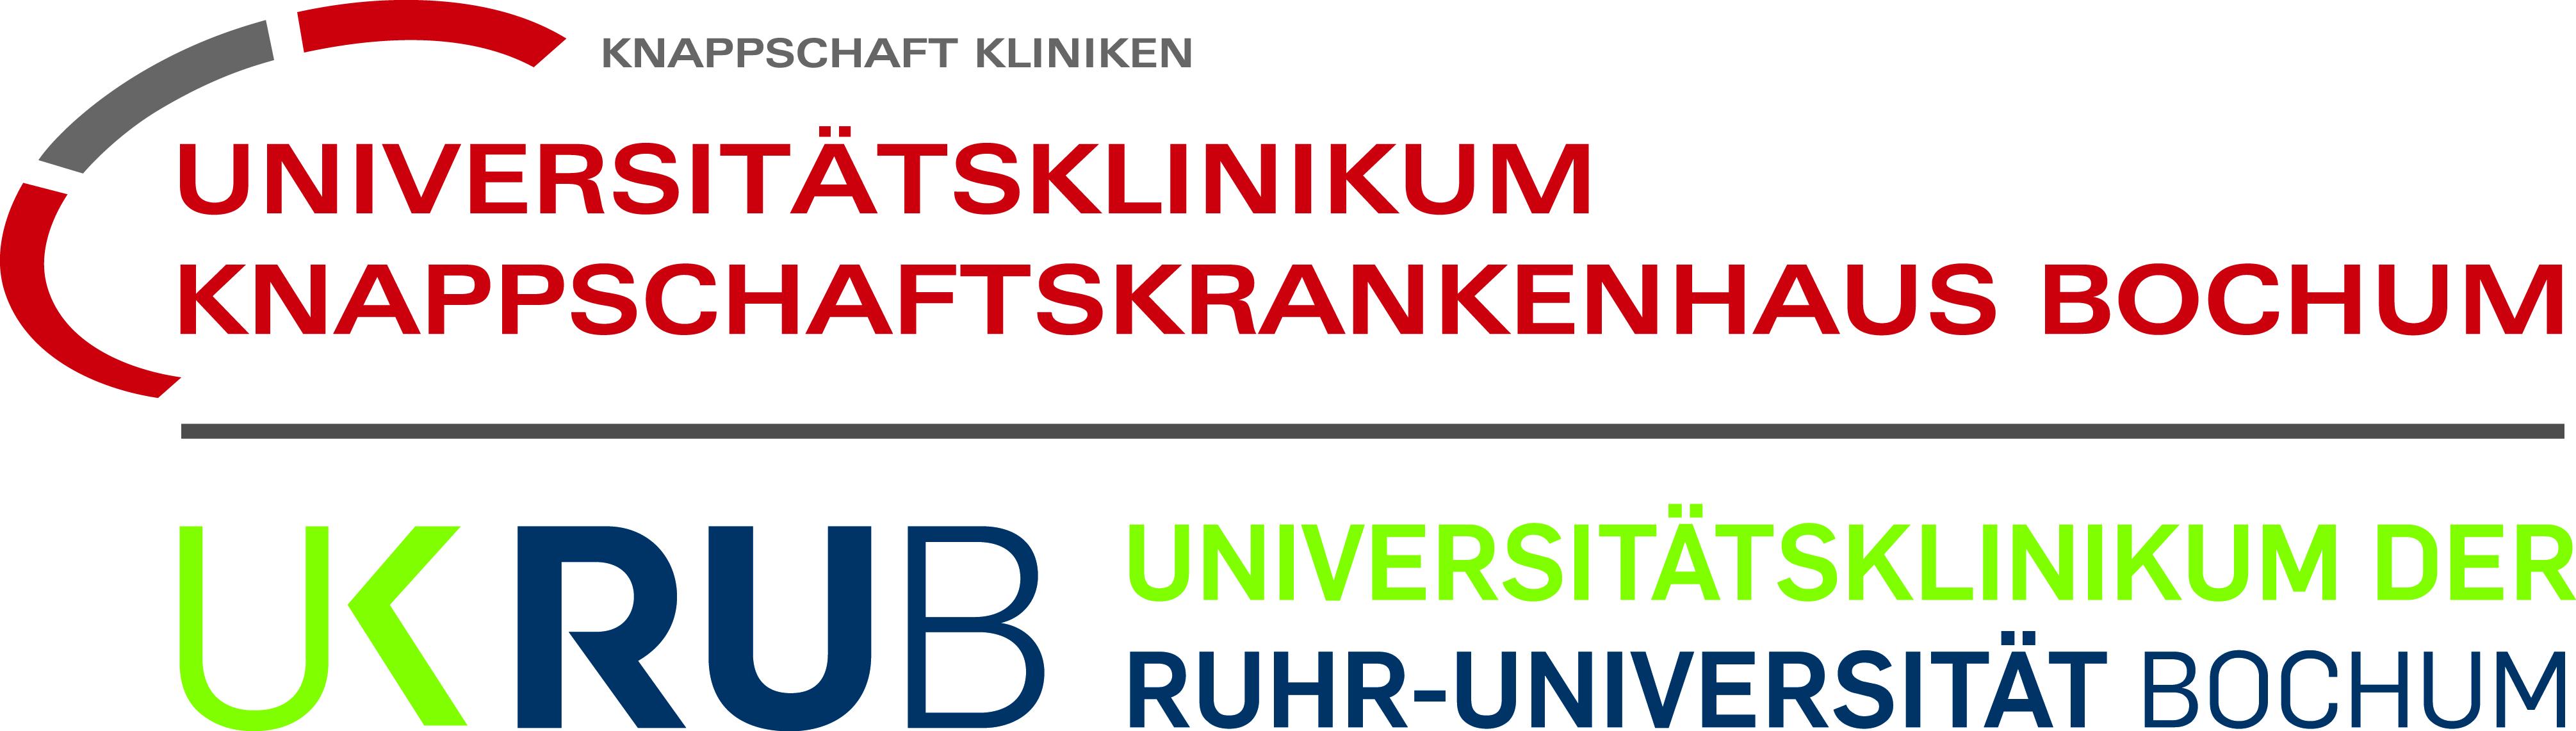 Universitätsklinikum Knappschaftskrankenhaus Bochum GmbH